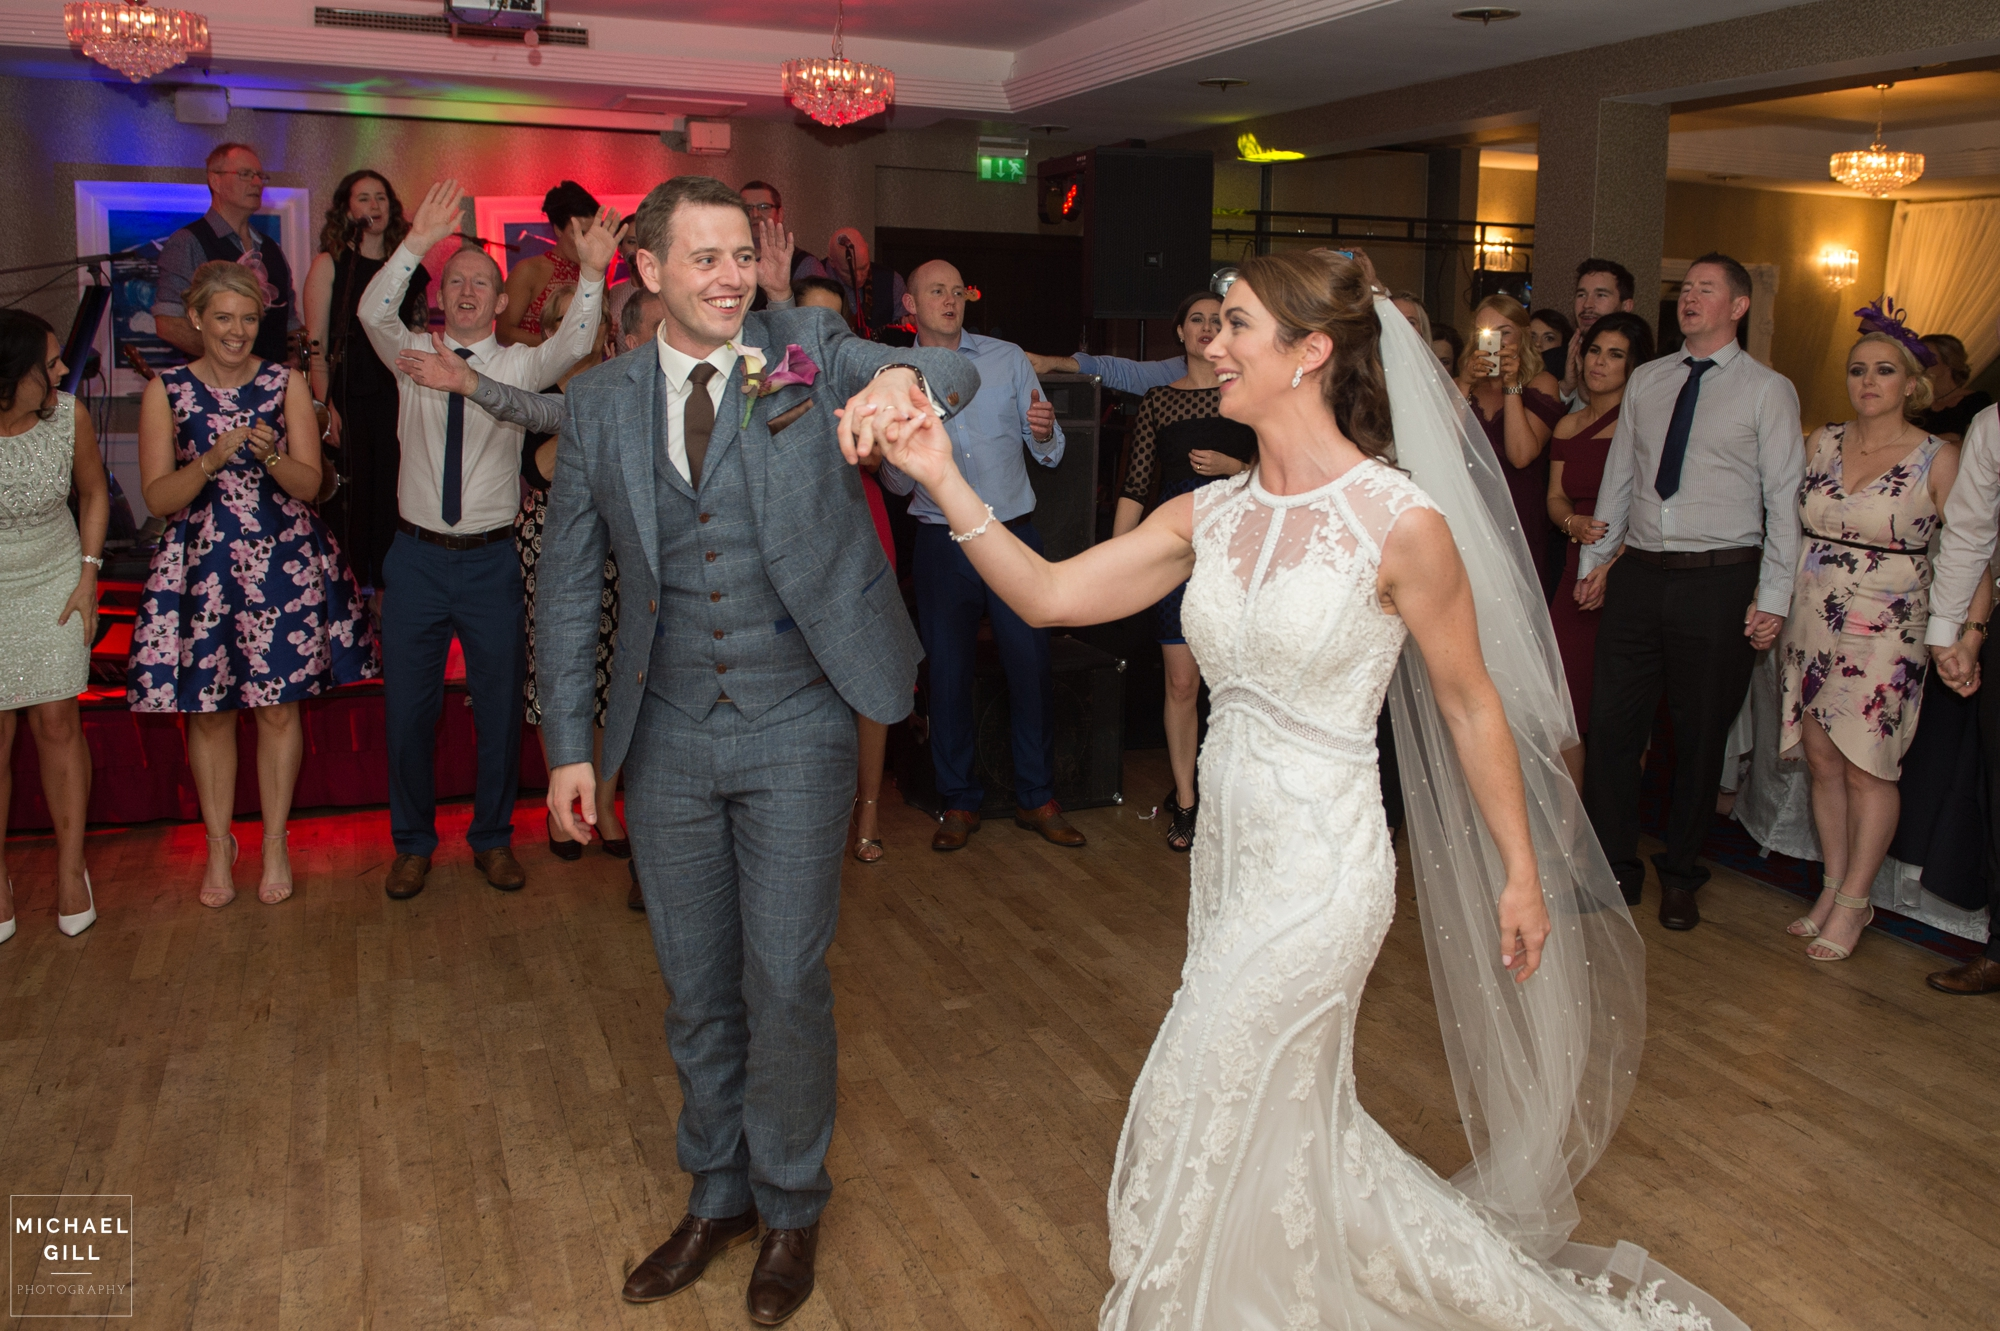 Michael_Gill_Photography_Kinnego_Redcastle_Hotel_Wedding3 (1).jpg